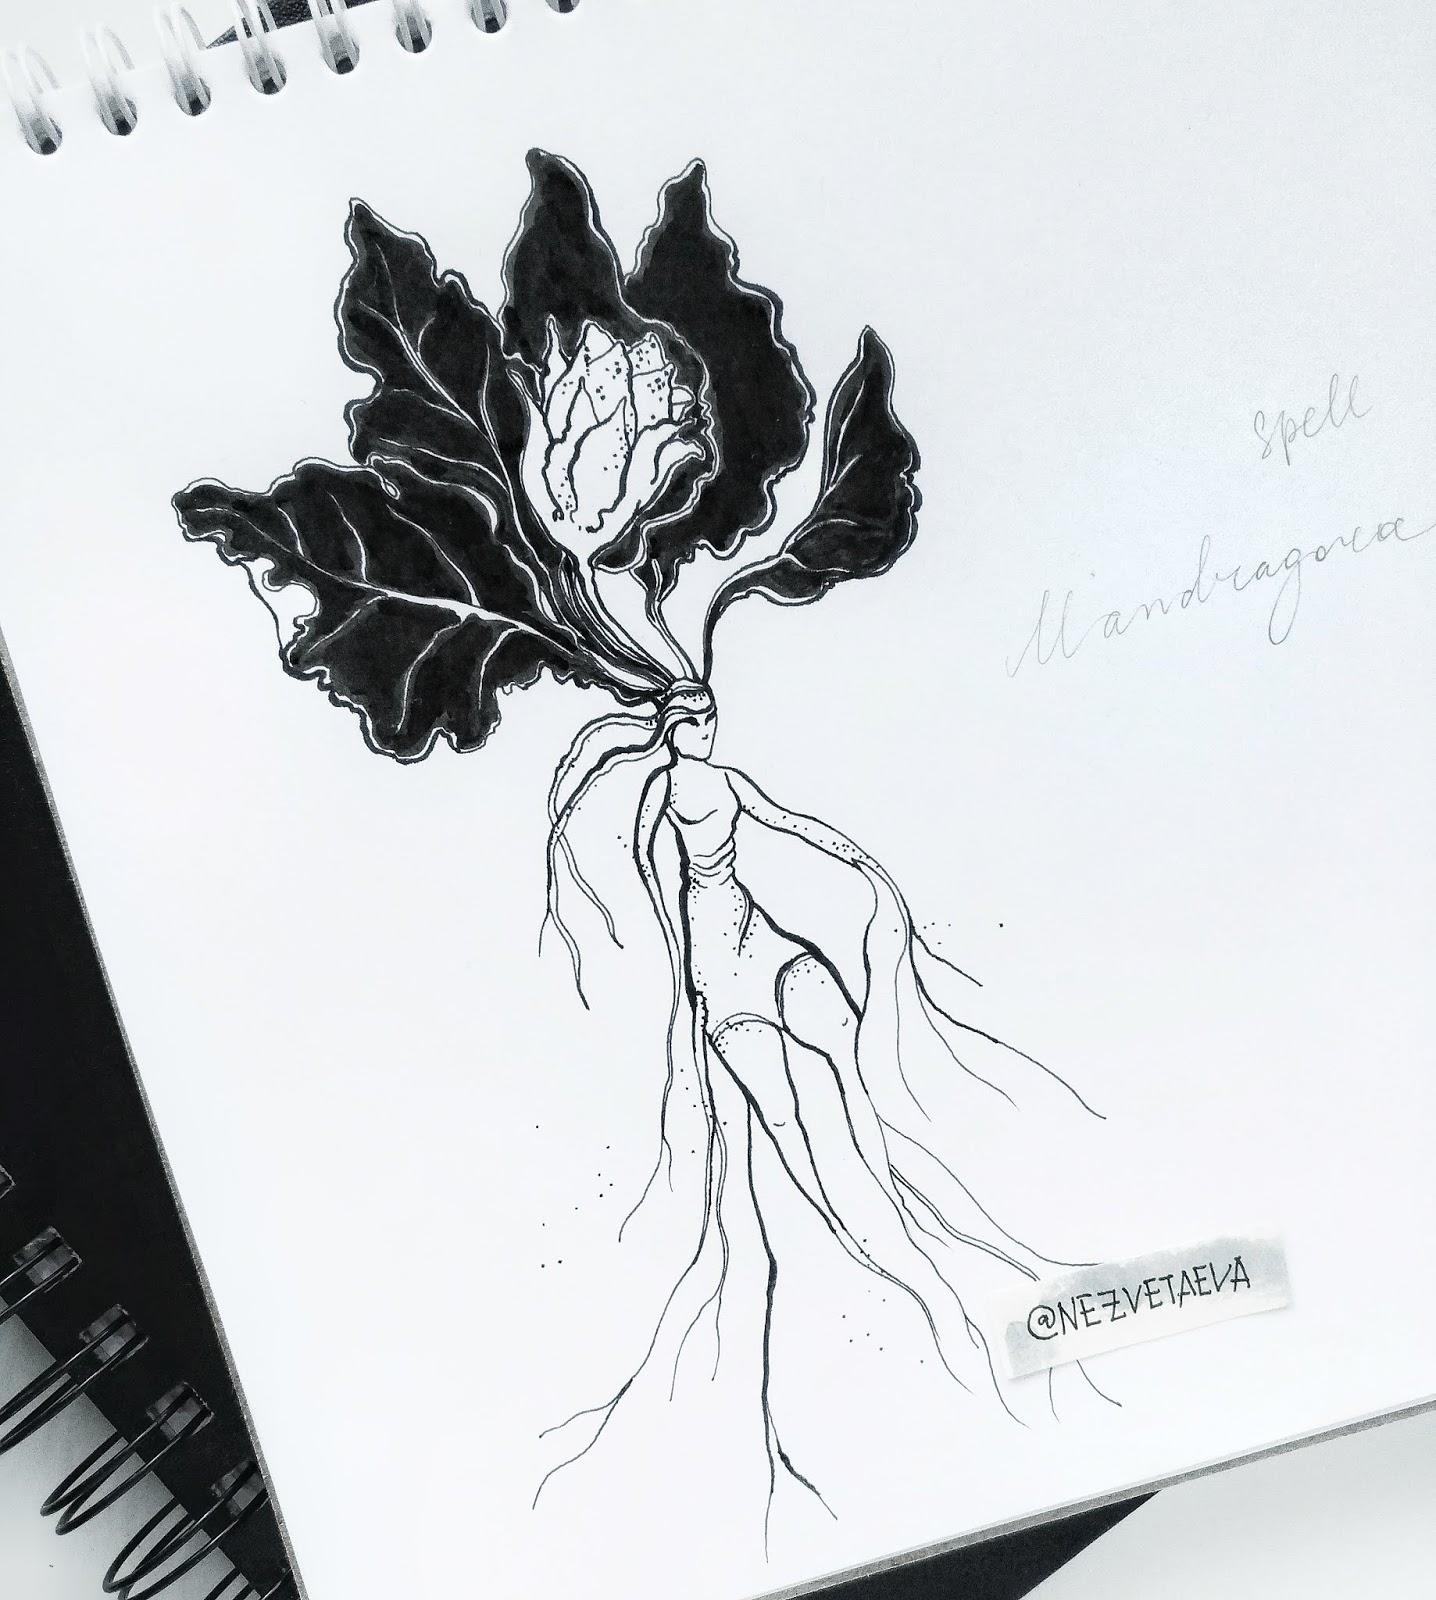 sonia-nezvetaeva-inktober2018-mandragora-dotwork-sketch